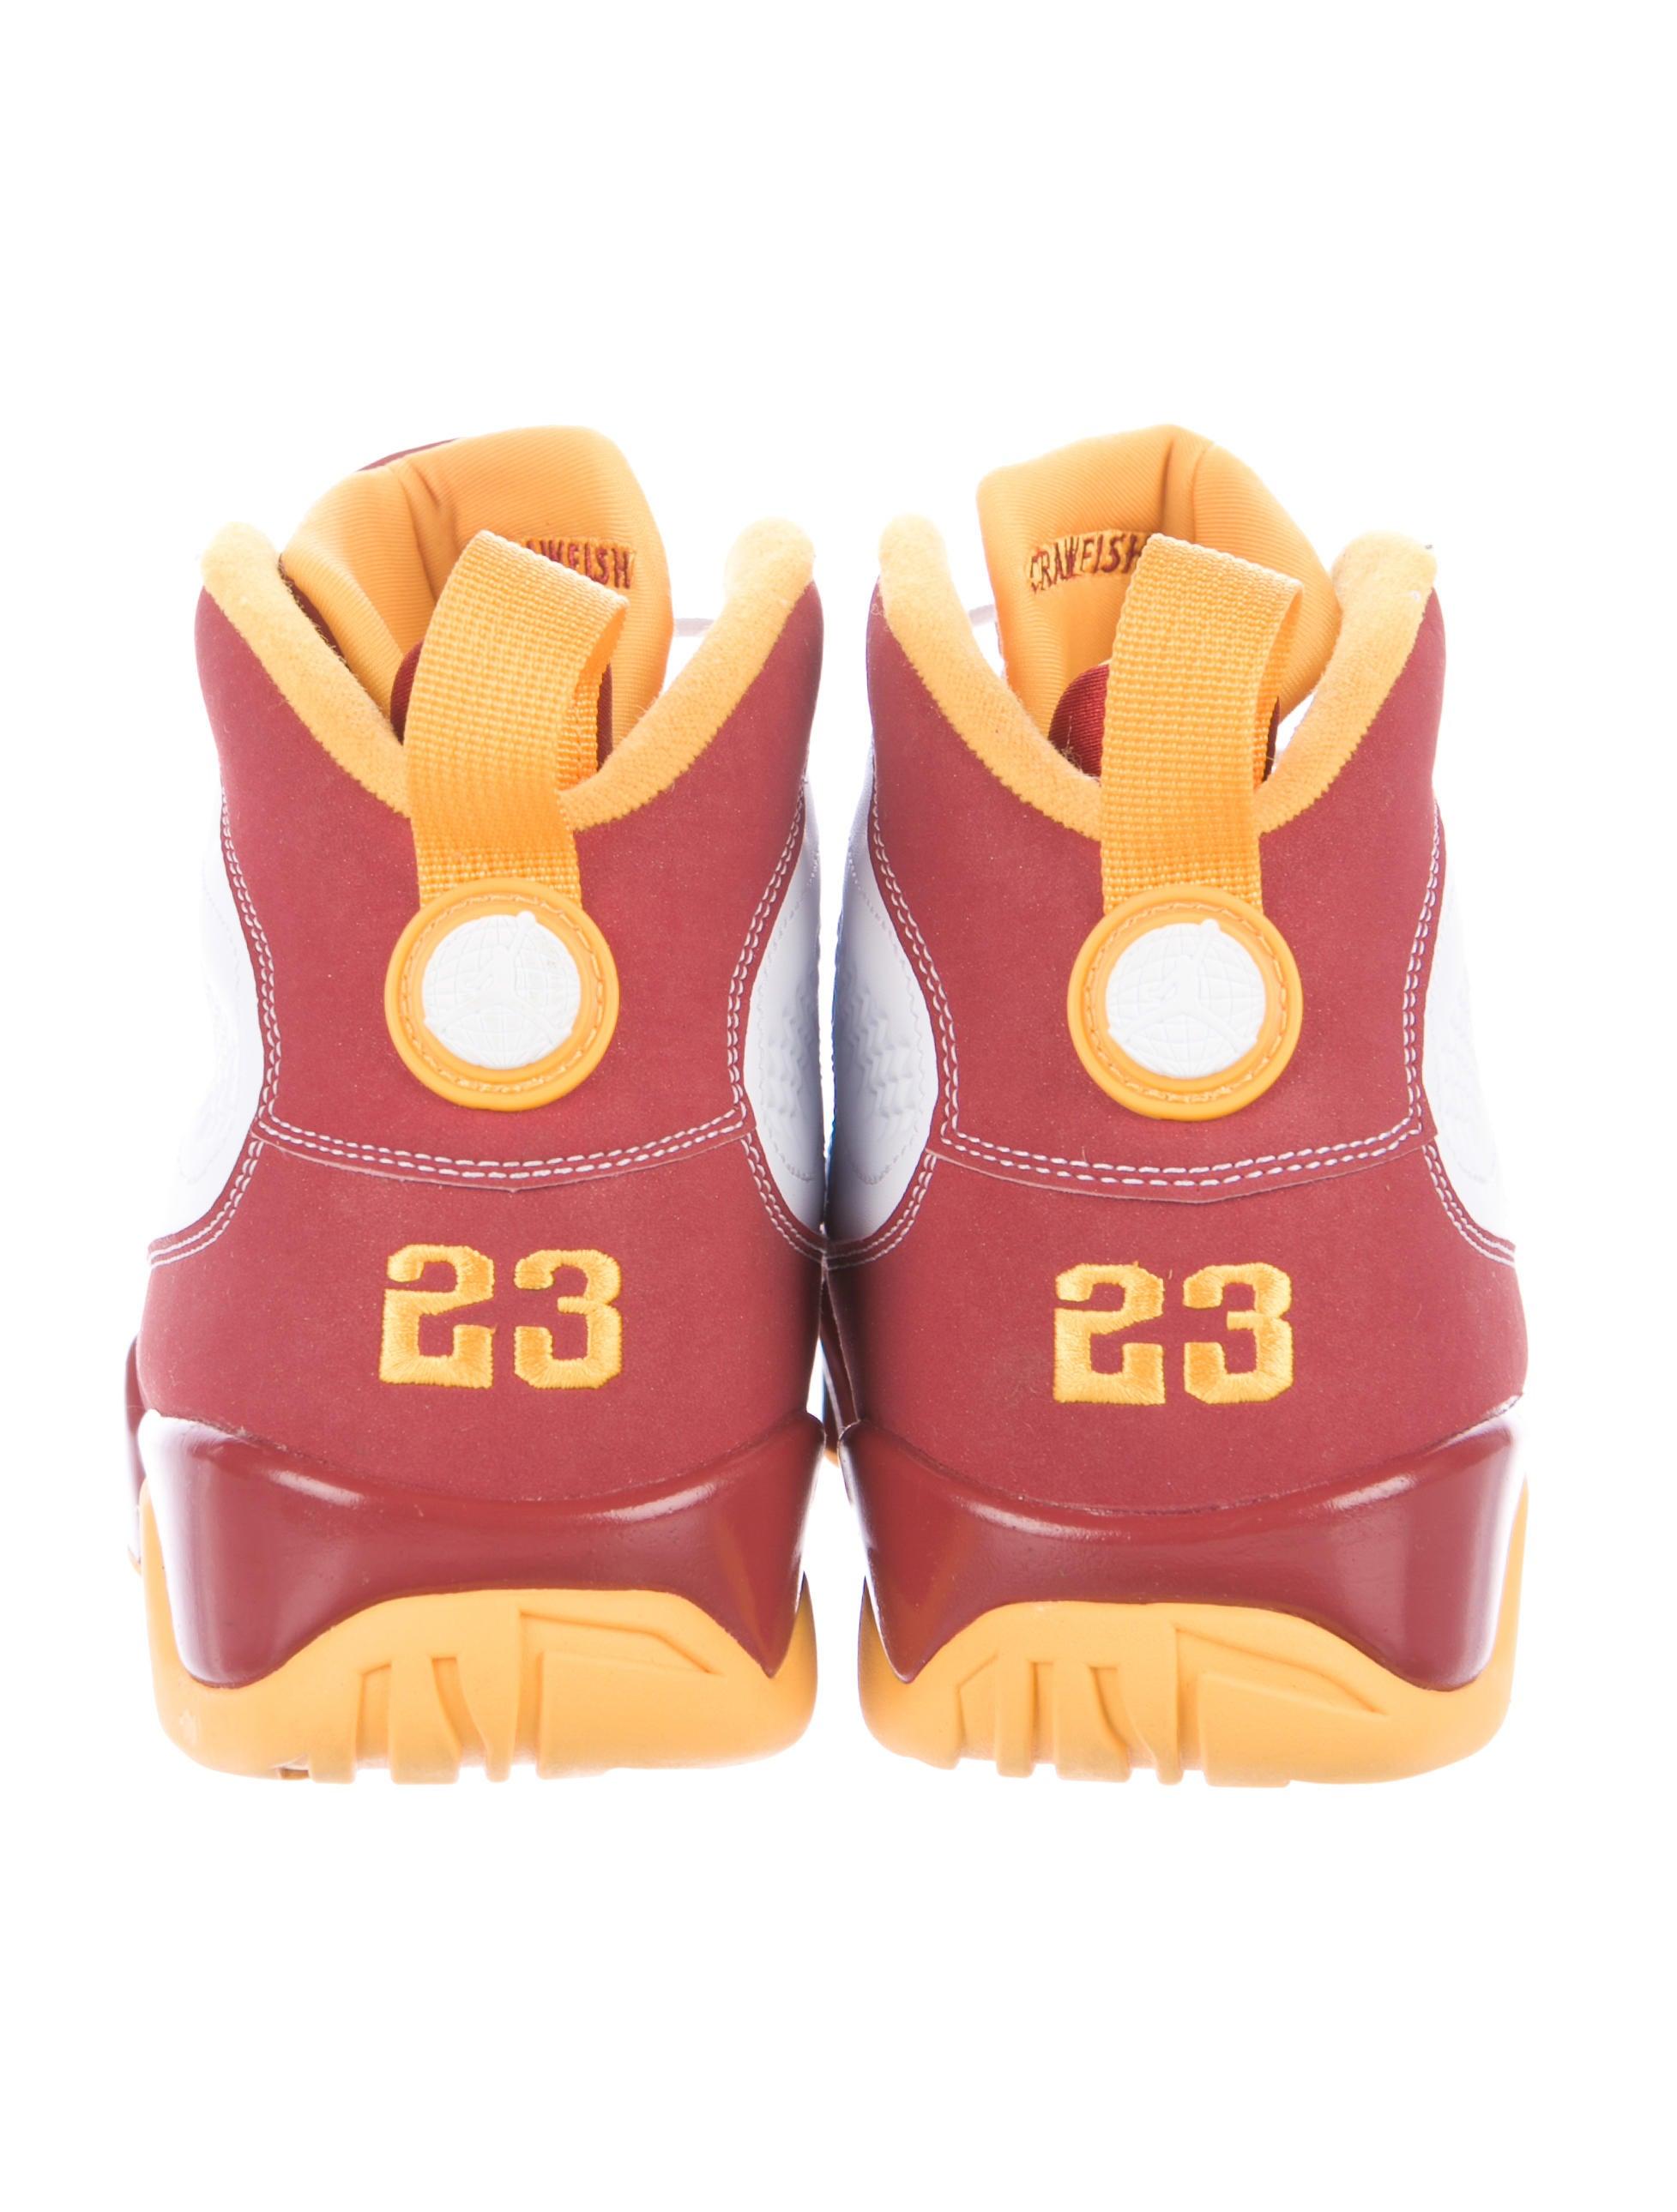 Nike Air Jordan Bentley Crawfish Ellis Sneakers Shoes